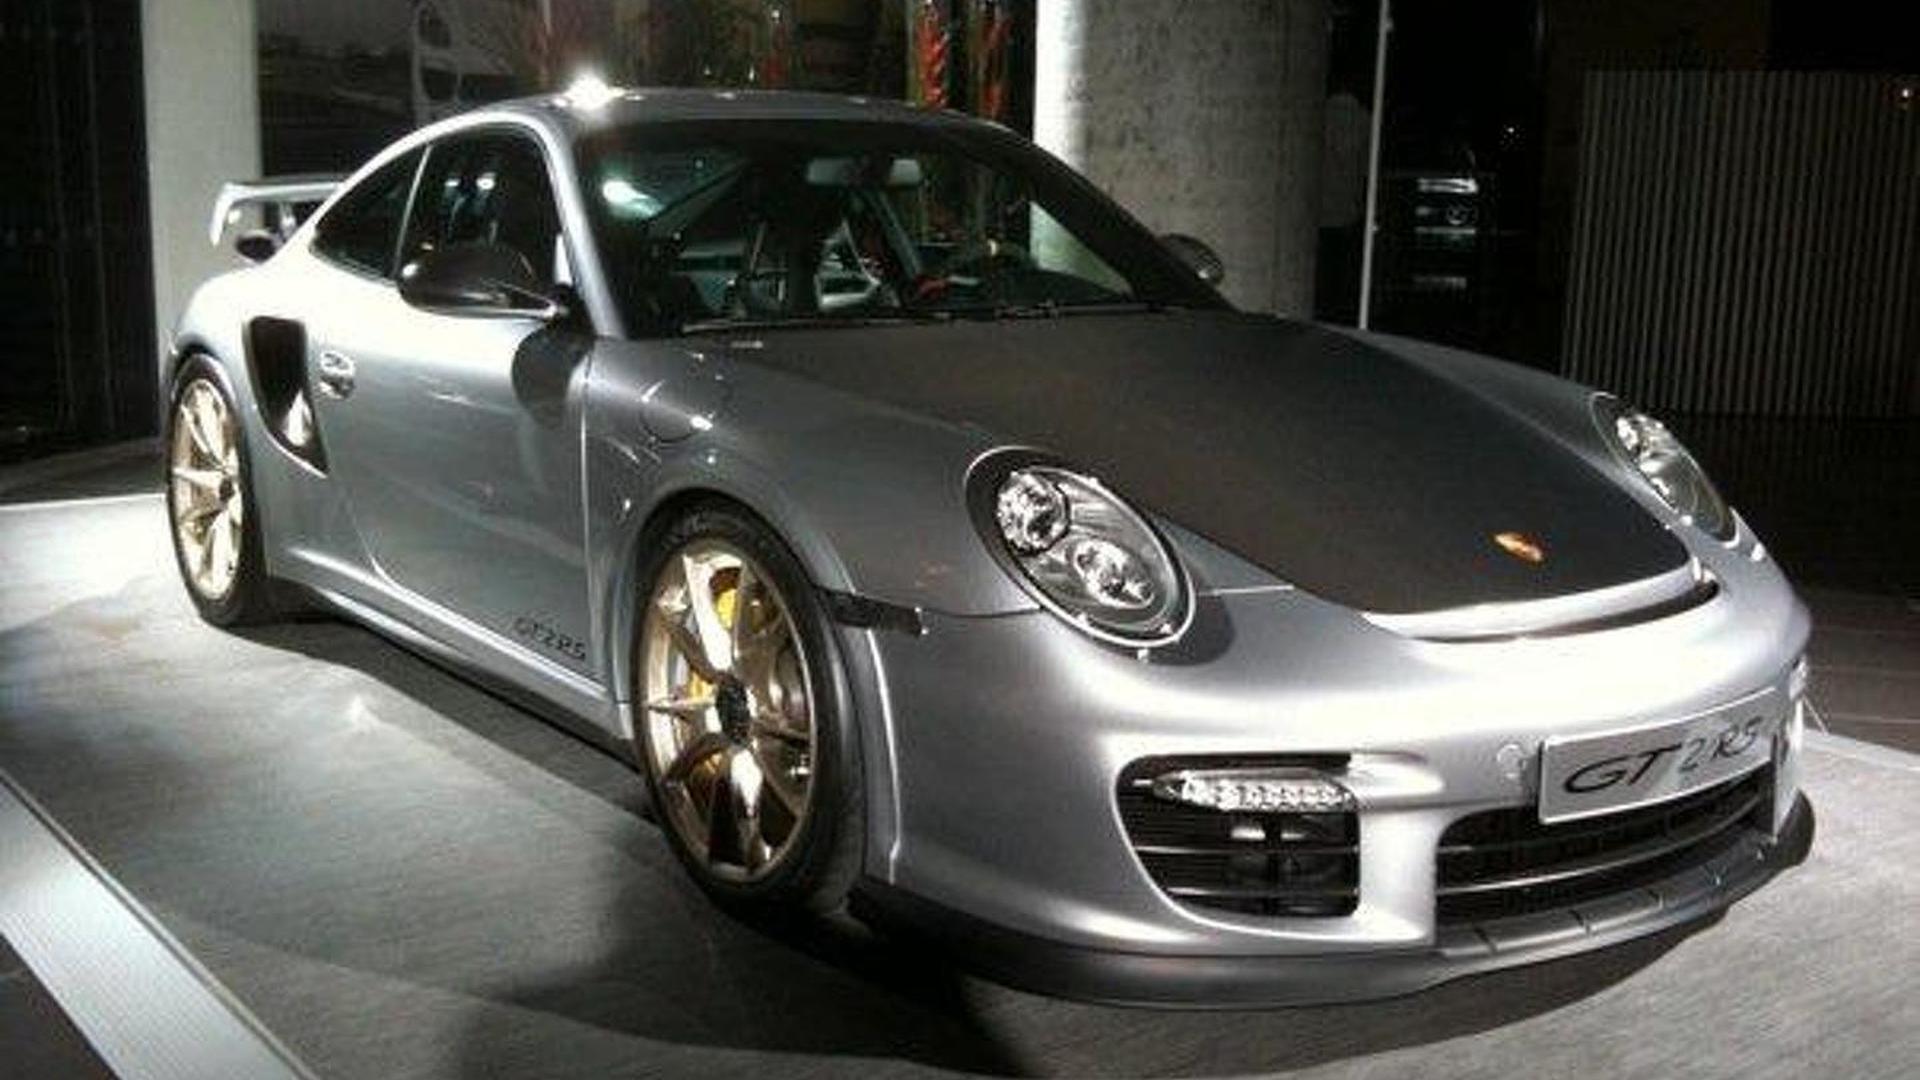 2010-201265-2011-porsche-911-gt2-rs1 Fascinating Porsche 911 Gt2 Rs Vs Gt3 Rs Cars Trend